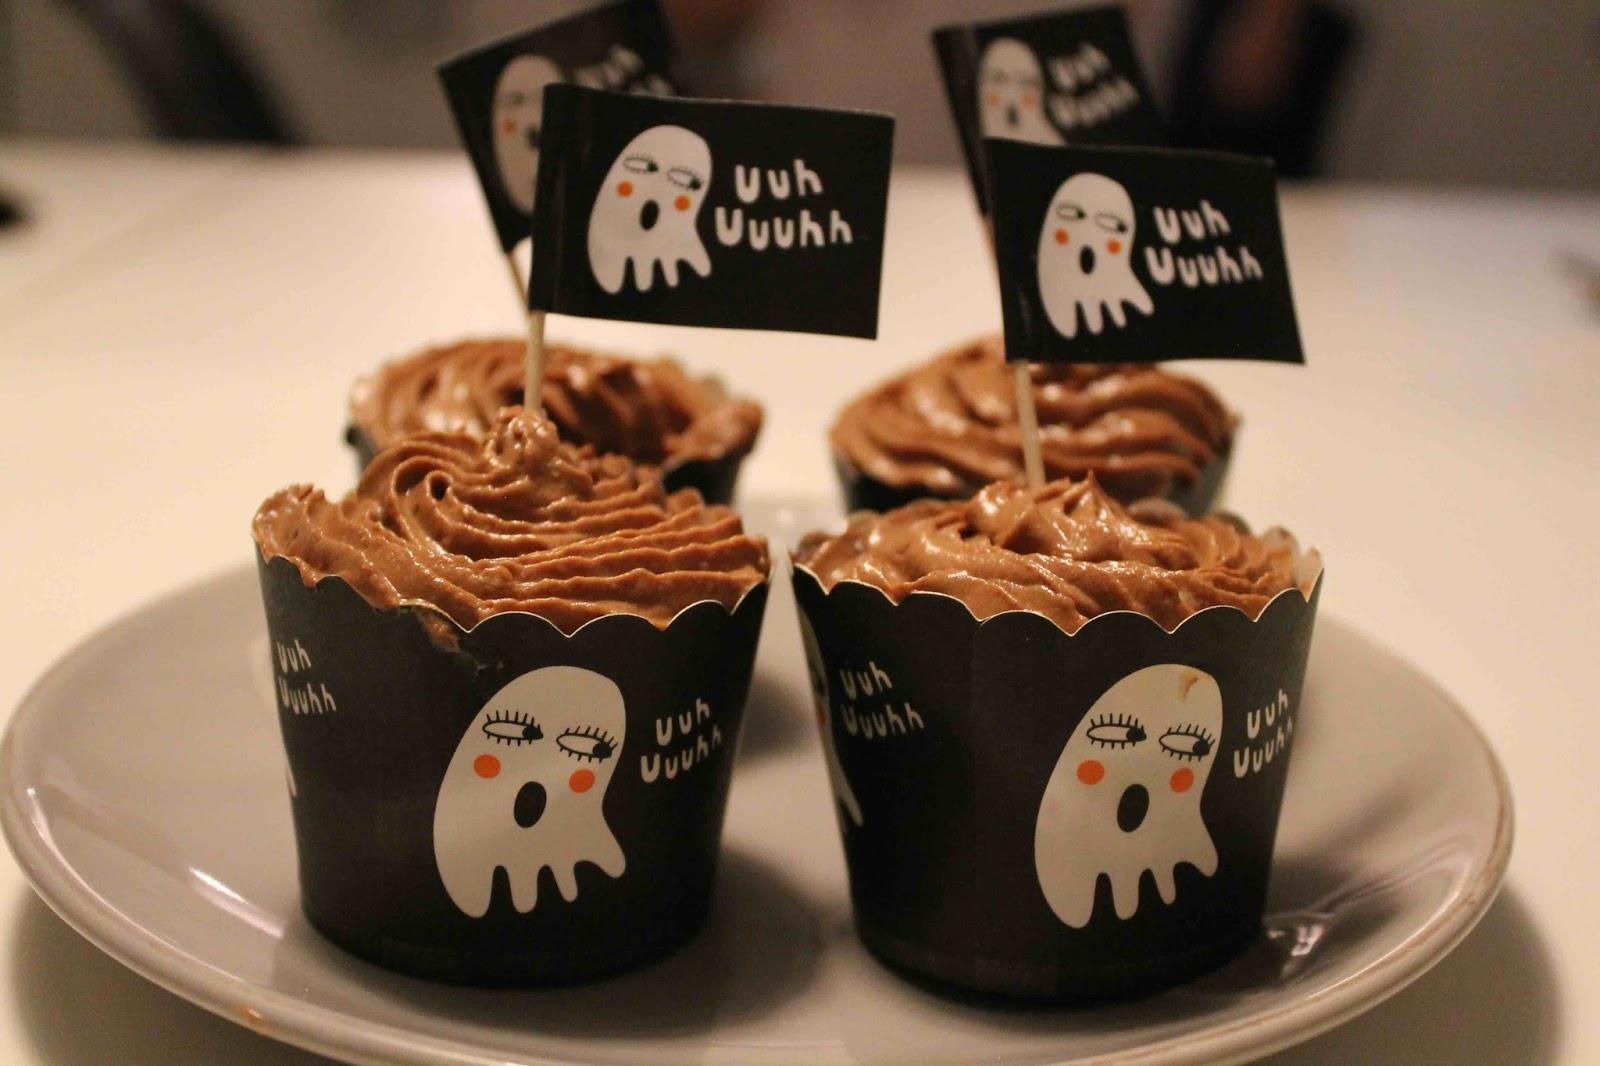 Chokladcupcakes i halloween-formar